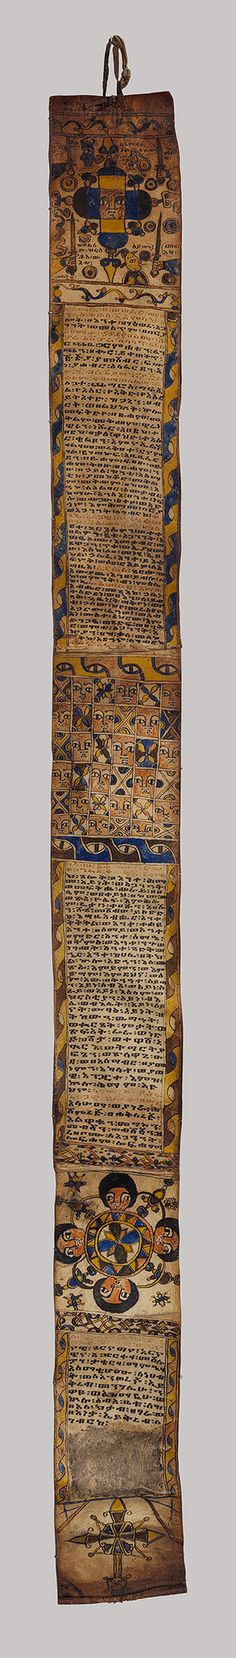 Healing scroll [Ethiopia] (2012.5) | Heilbrunn Timeline of Art History | The Metropolitan Museum of Art